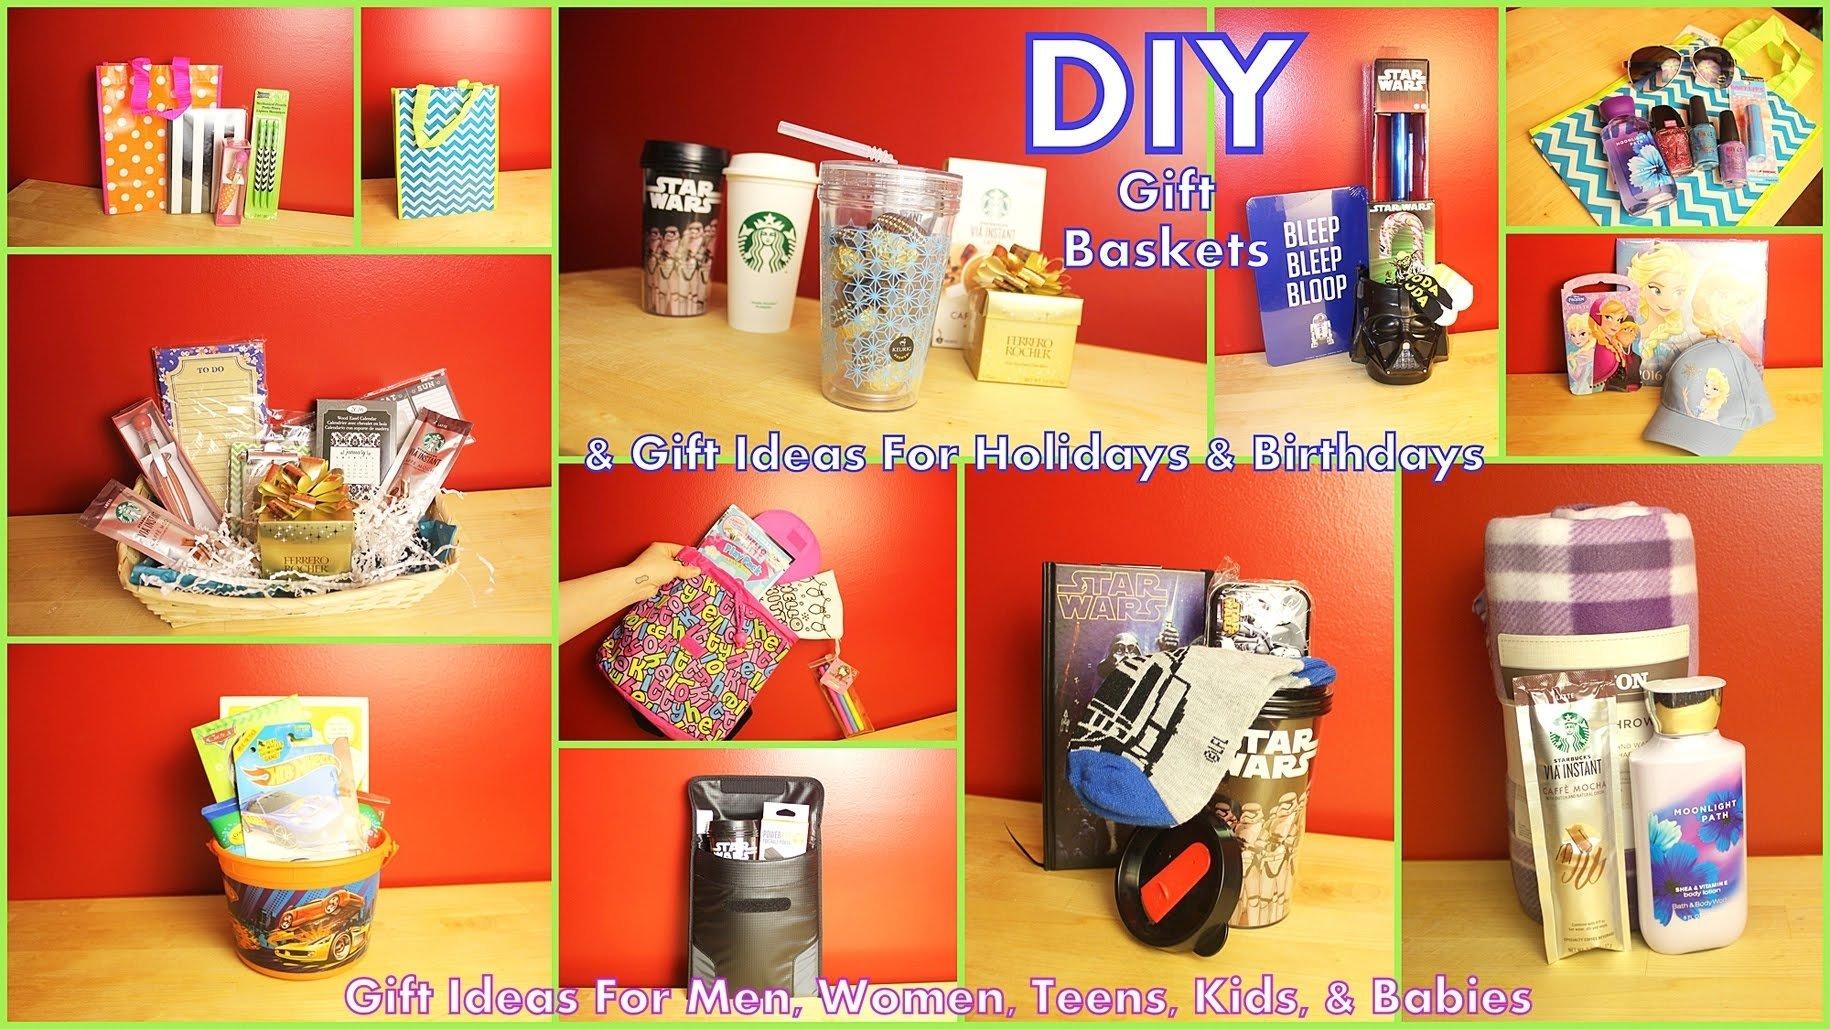 10 Stunning Birthday Gift Basket Ideas For Her diy gift baskets gift ideas how to assemble for men women kids 9 2020